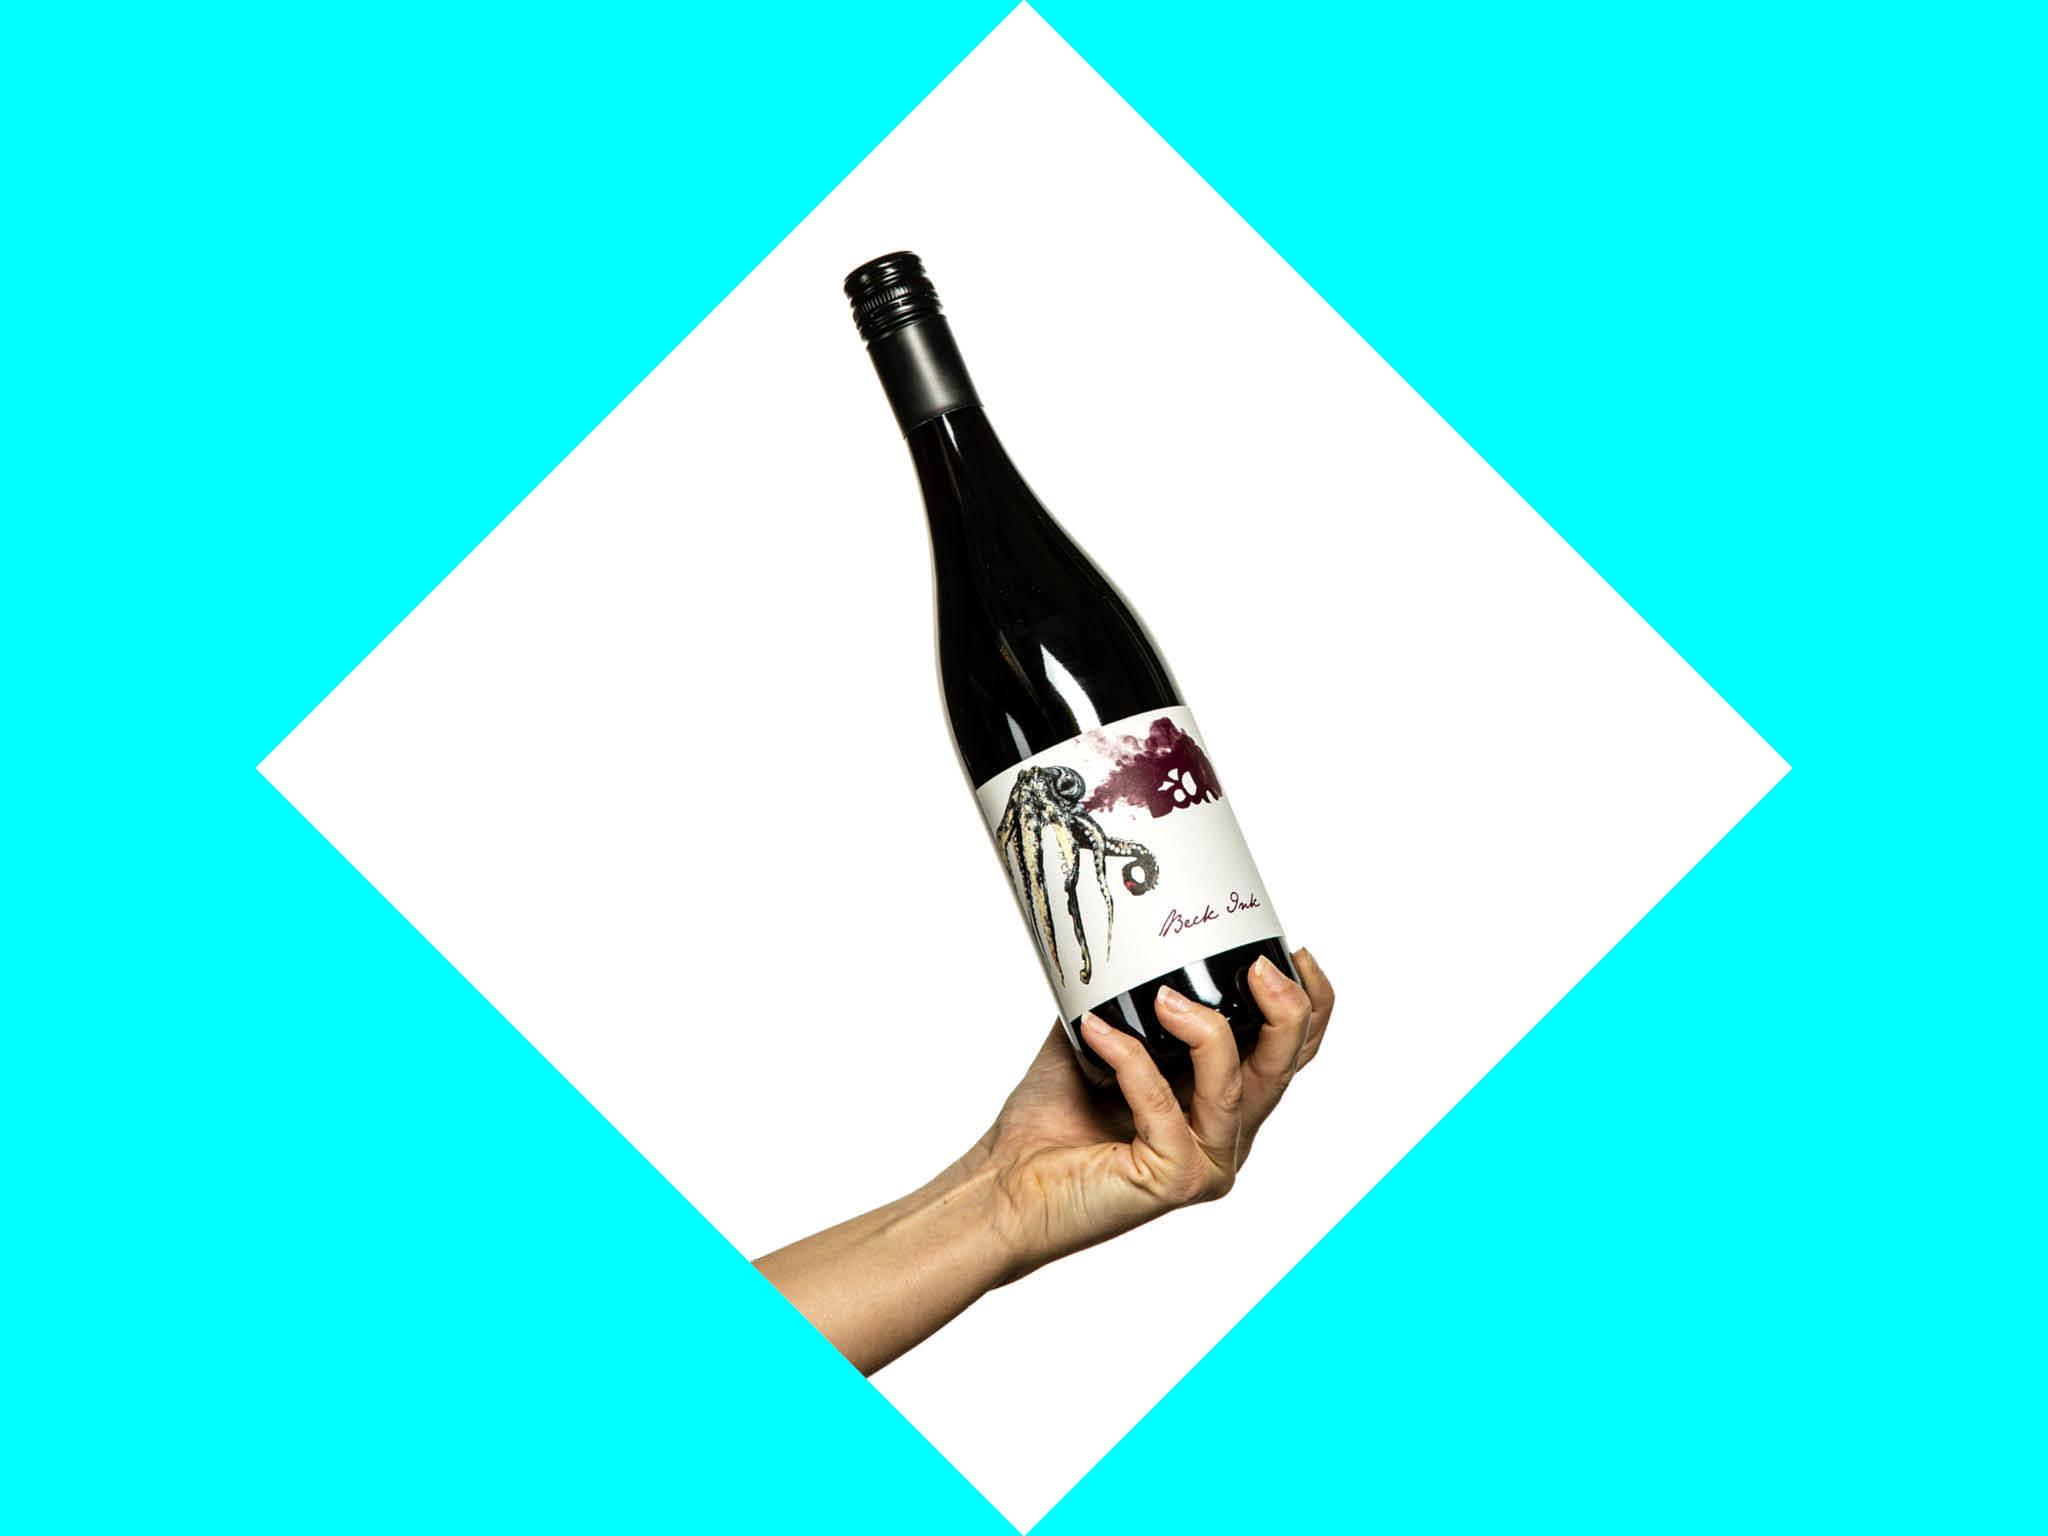 natural wine, judith beck ink